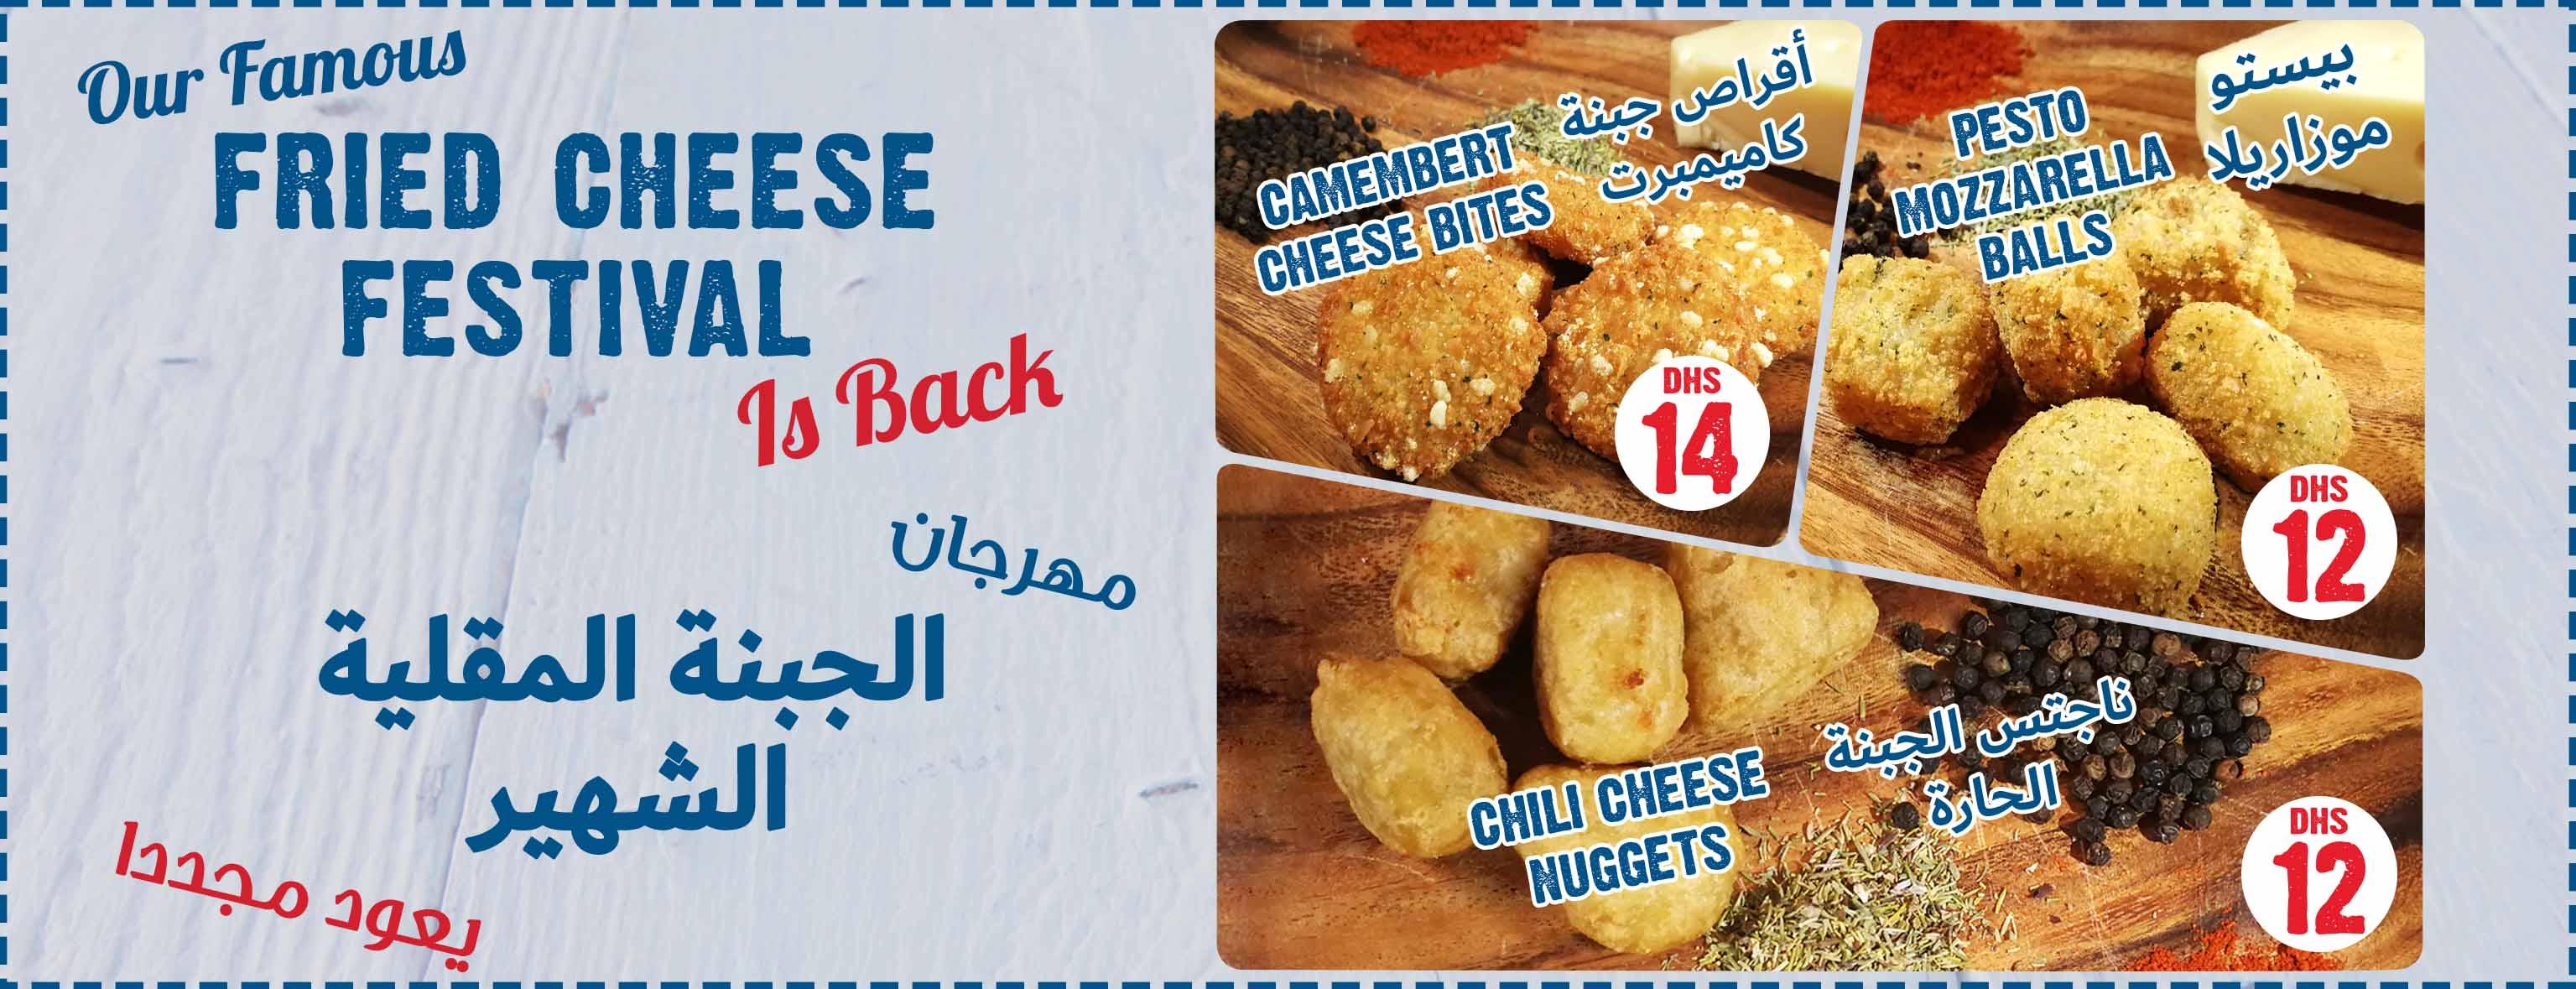 London Fish & Chips - Seafood Restaurant in Dubai, Saudi